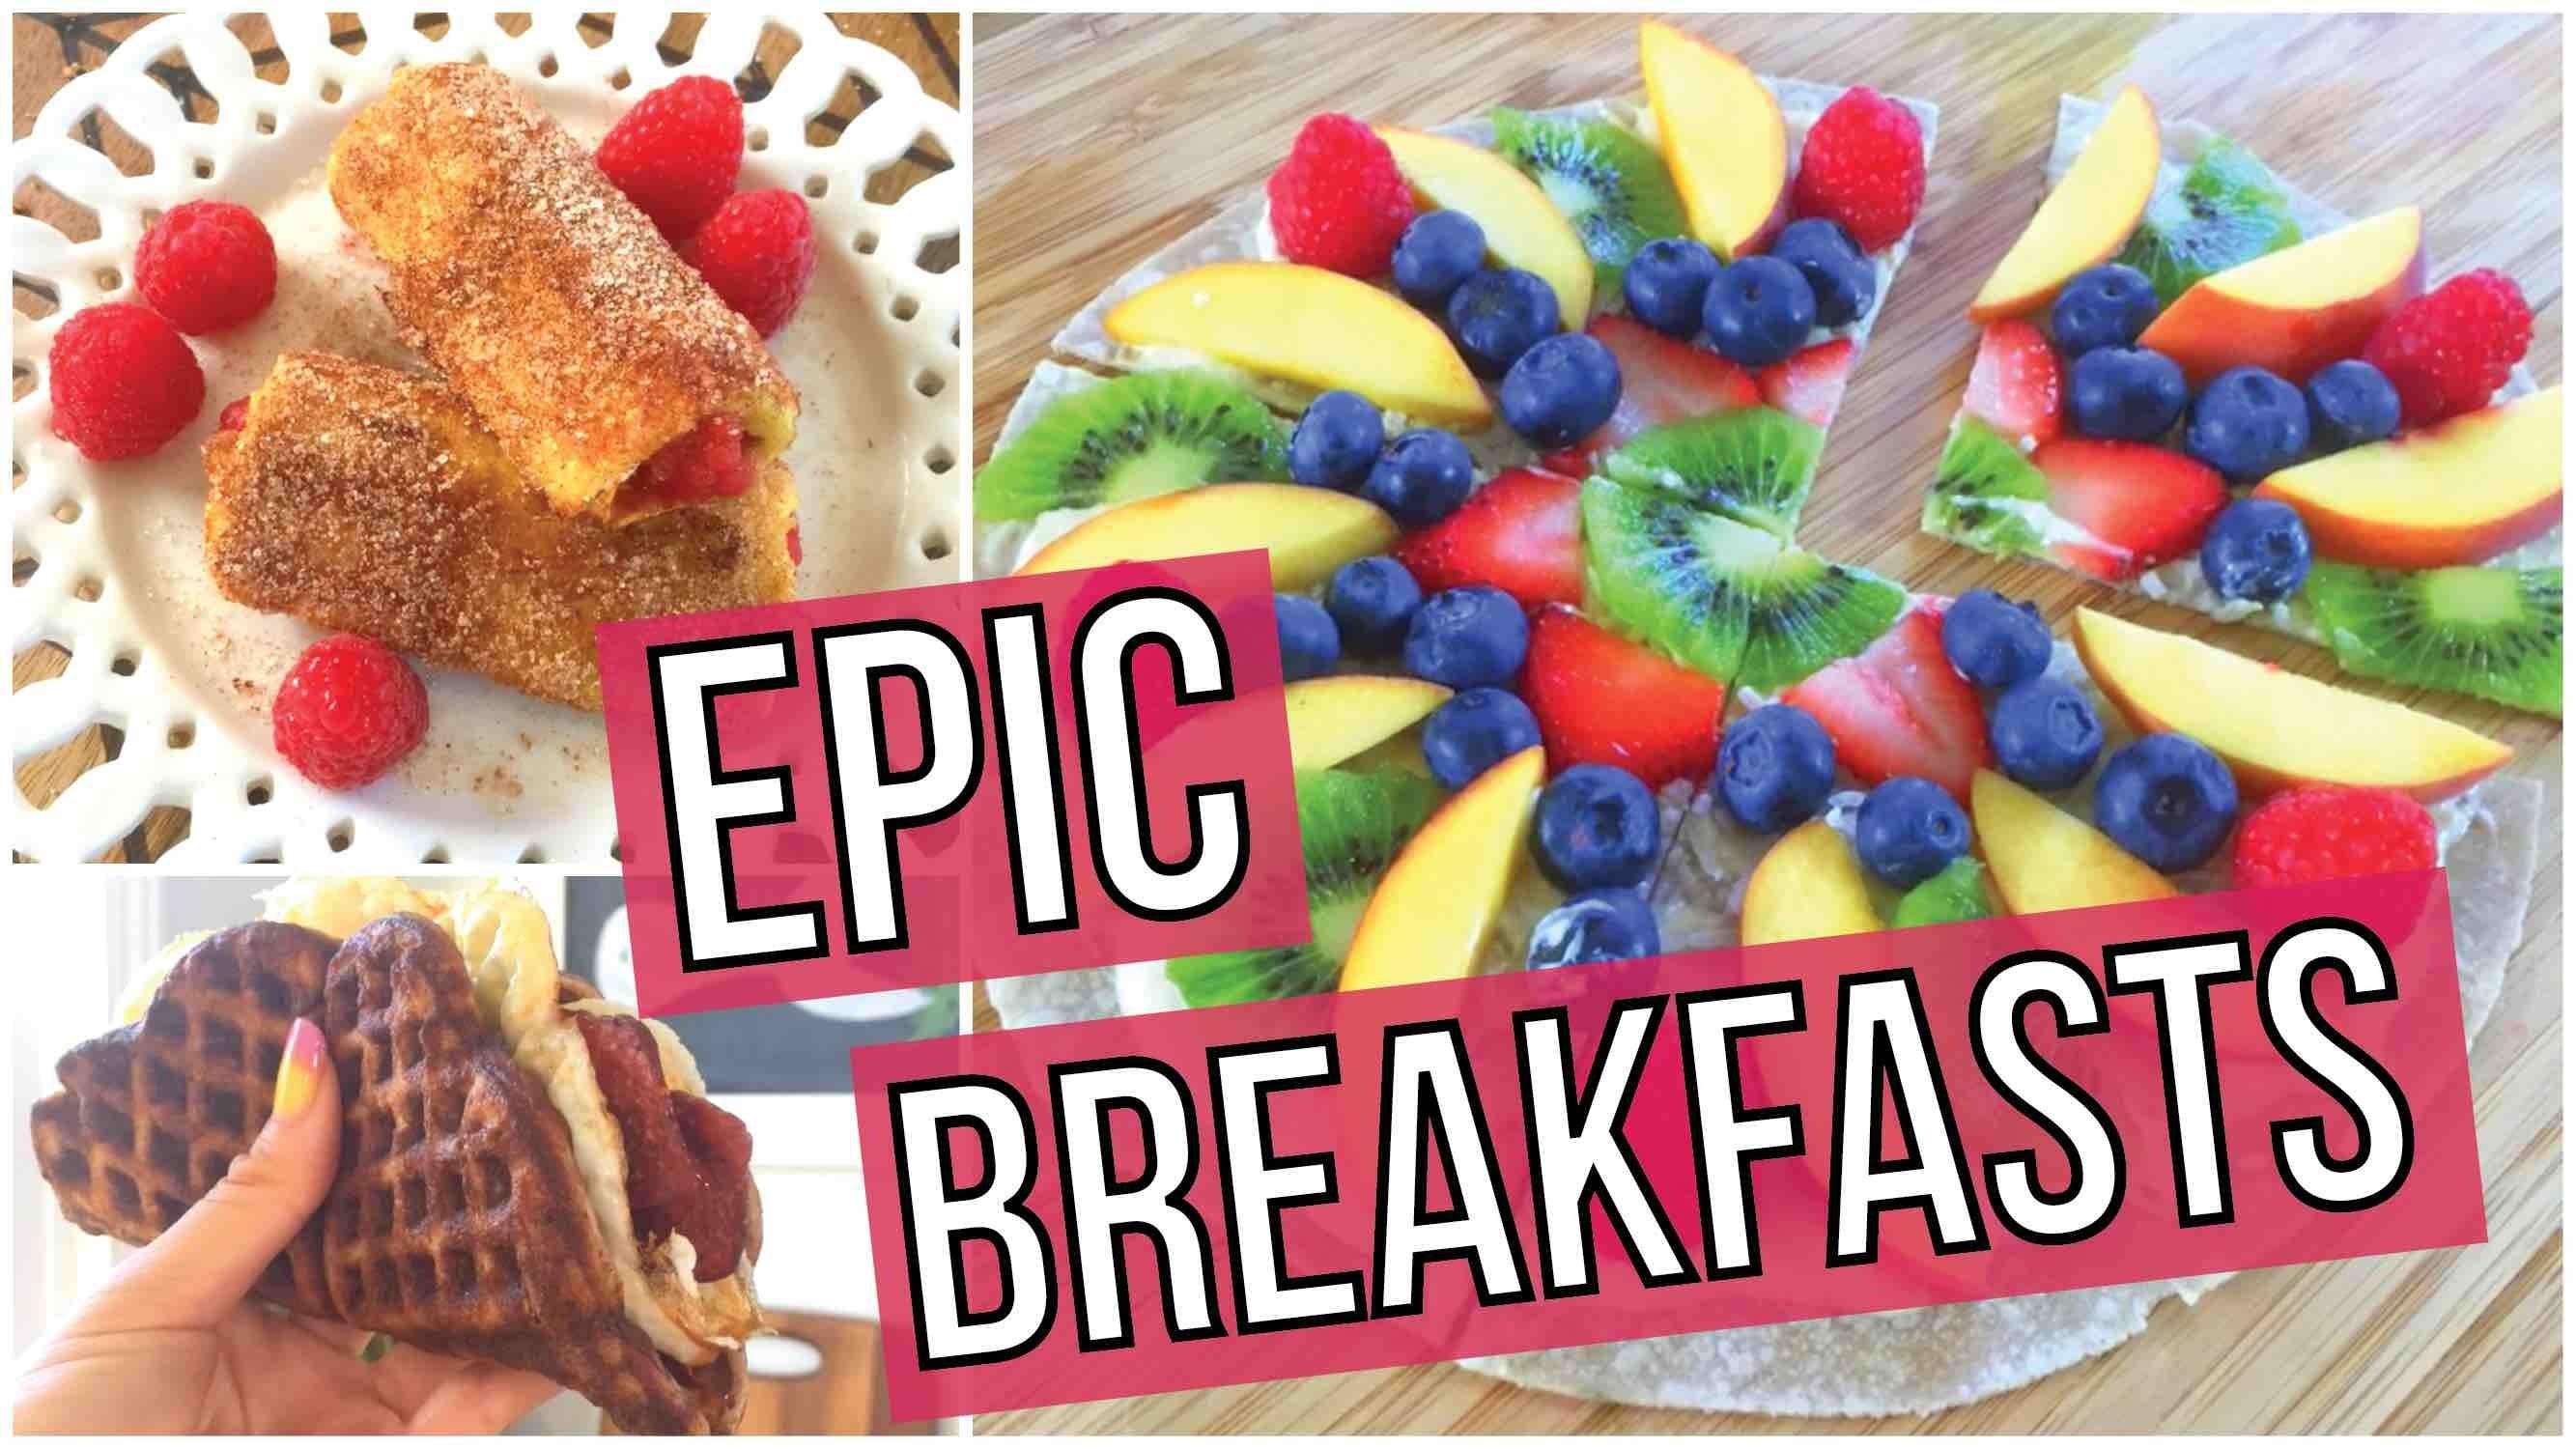 EPIC Breakfast Ideas - Waffle Taco, French Toast Rollups, Breakfast Pizza!